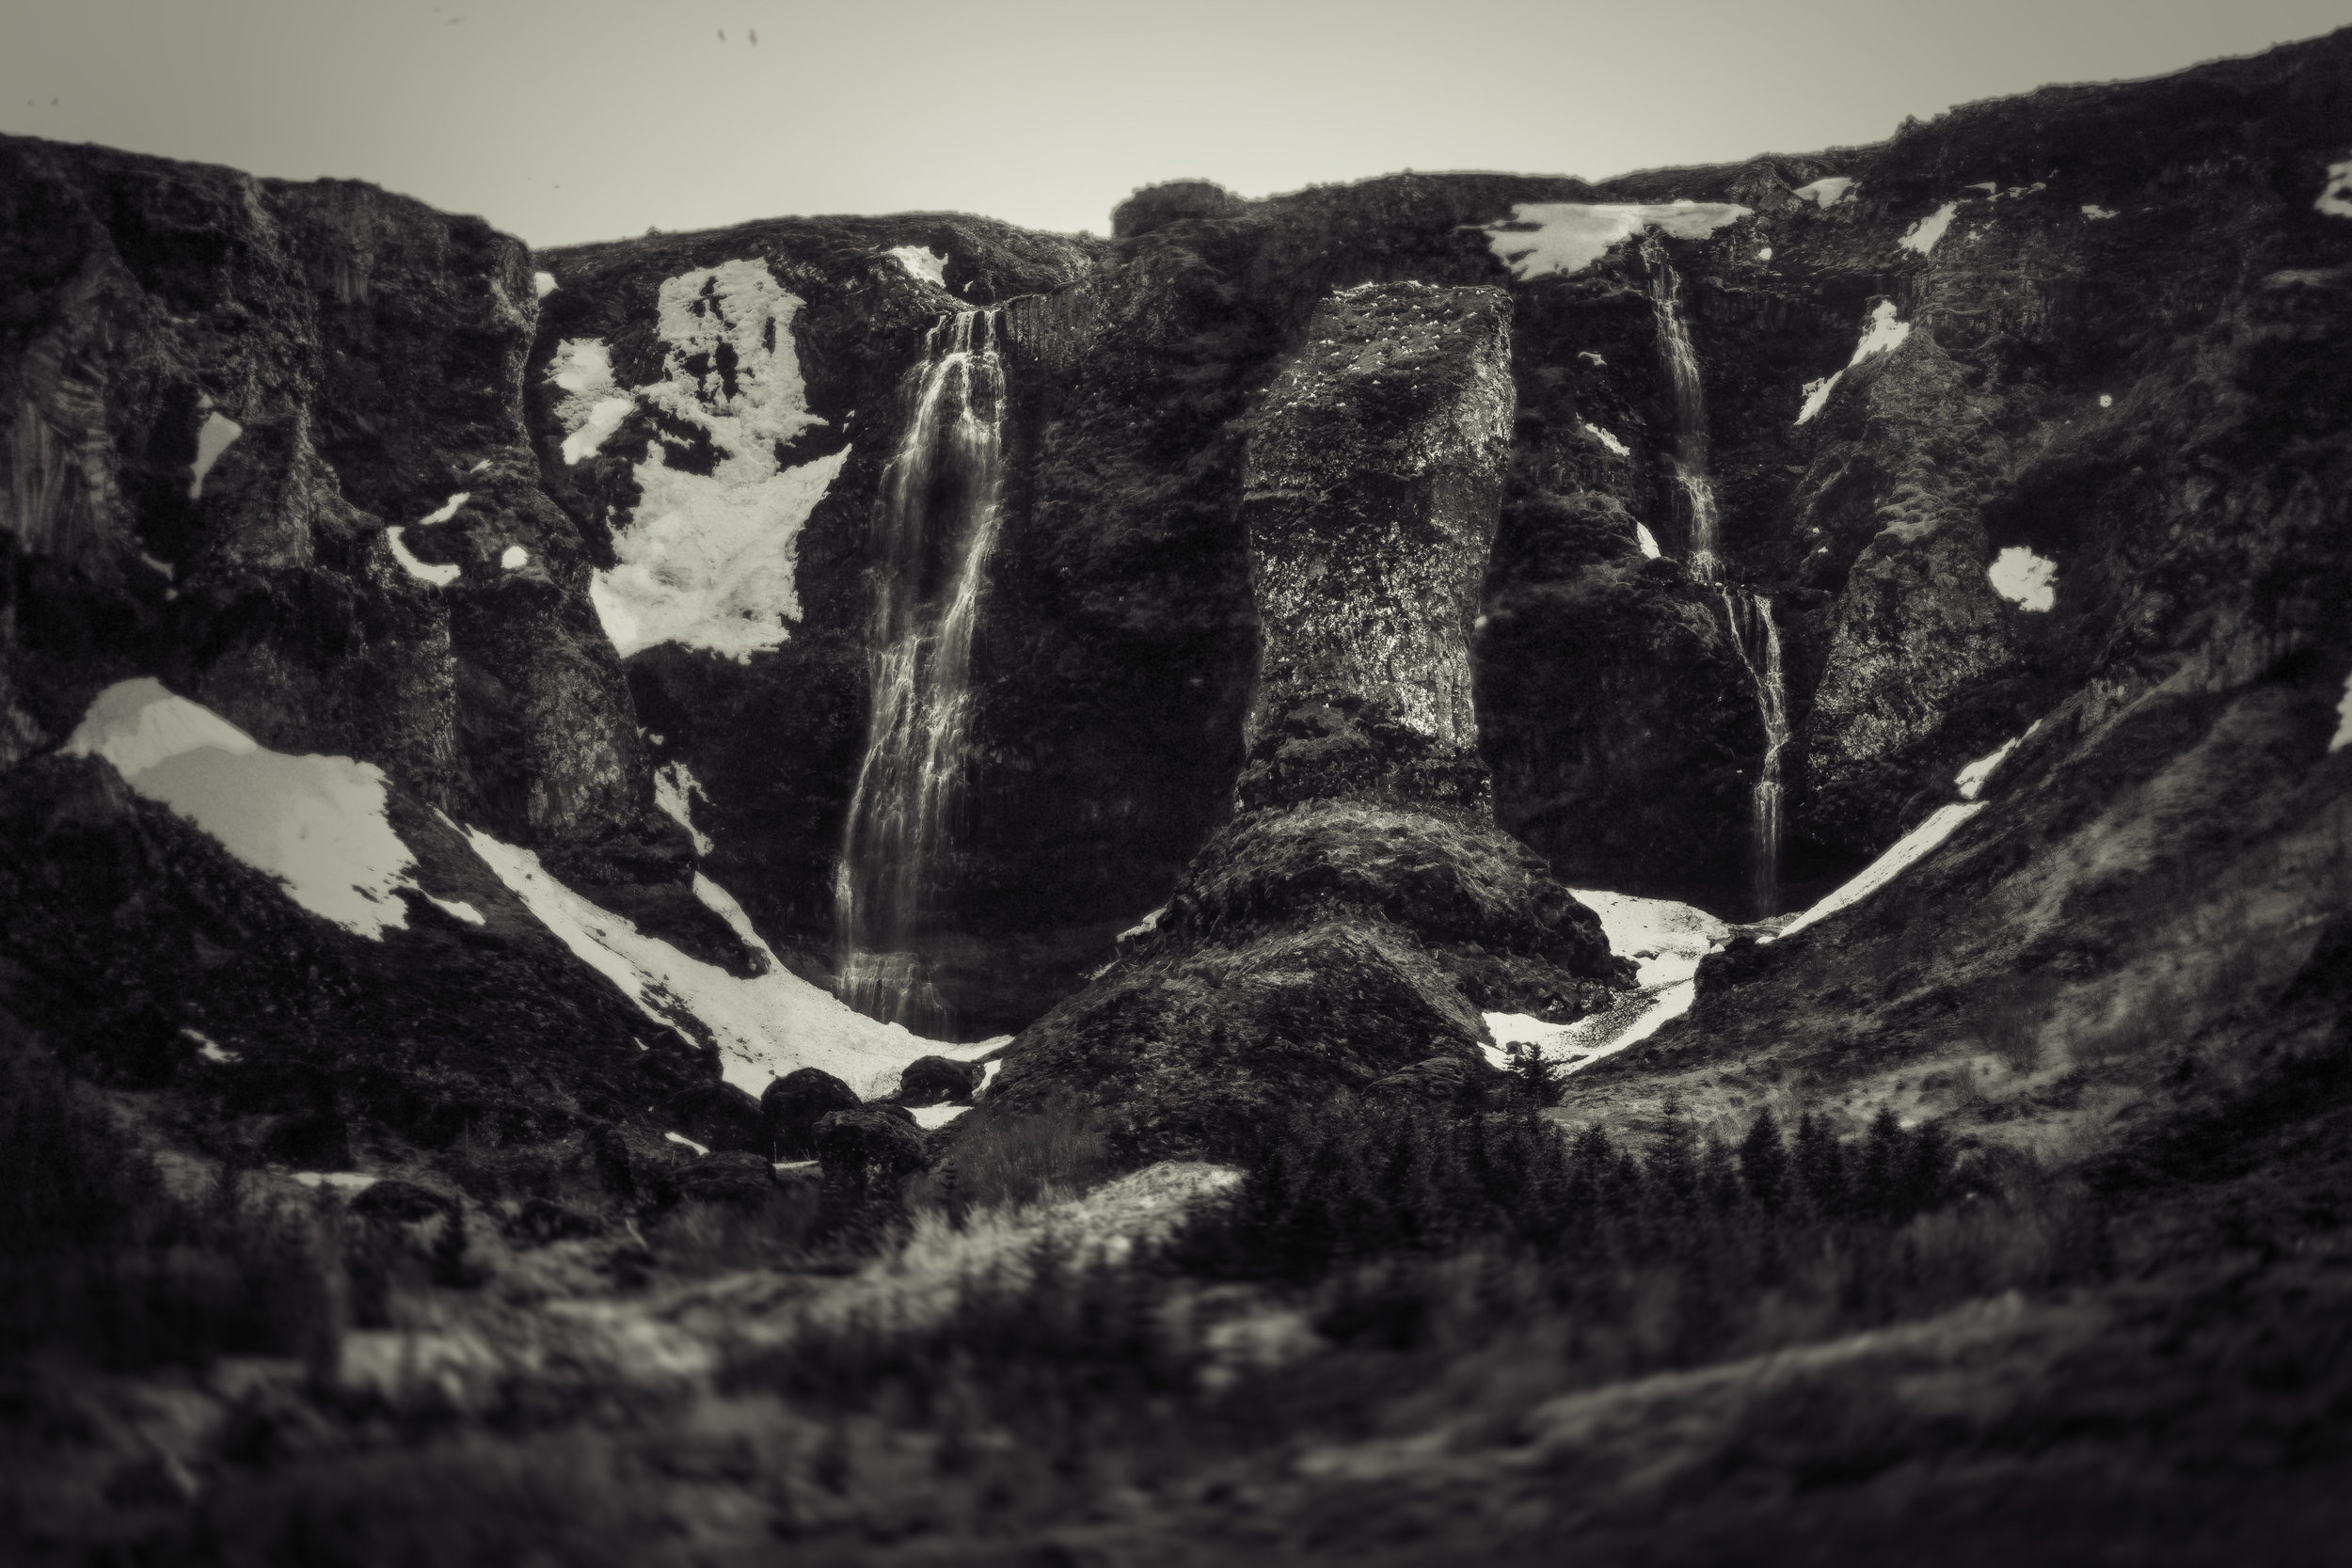 Waterfall on the cliffs of Grundarfjordur Iceland